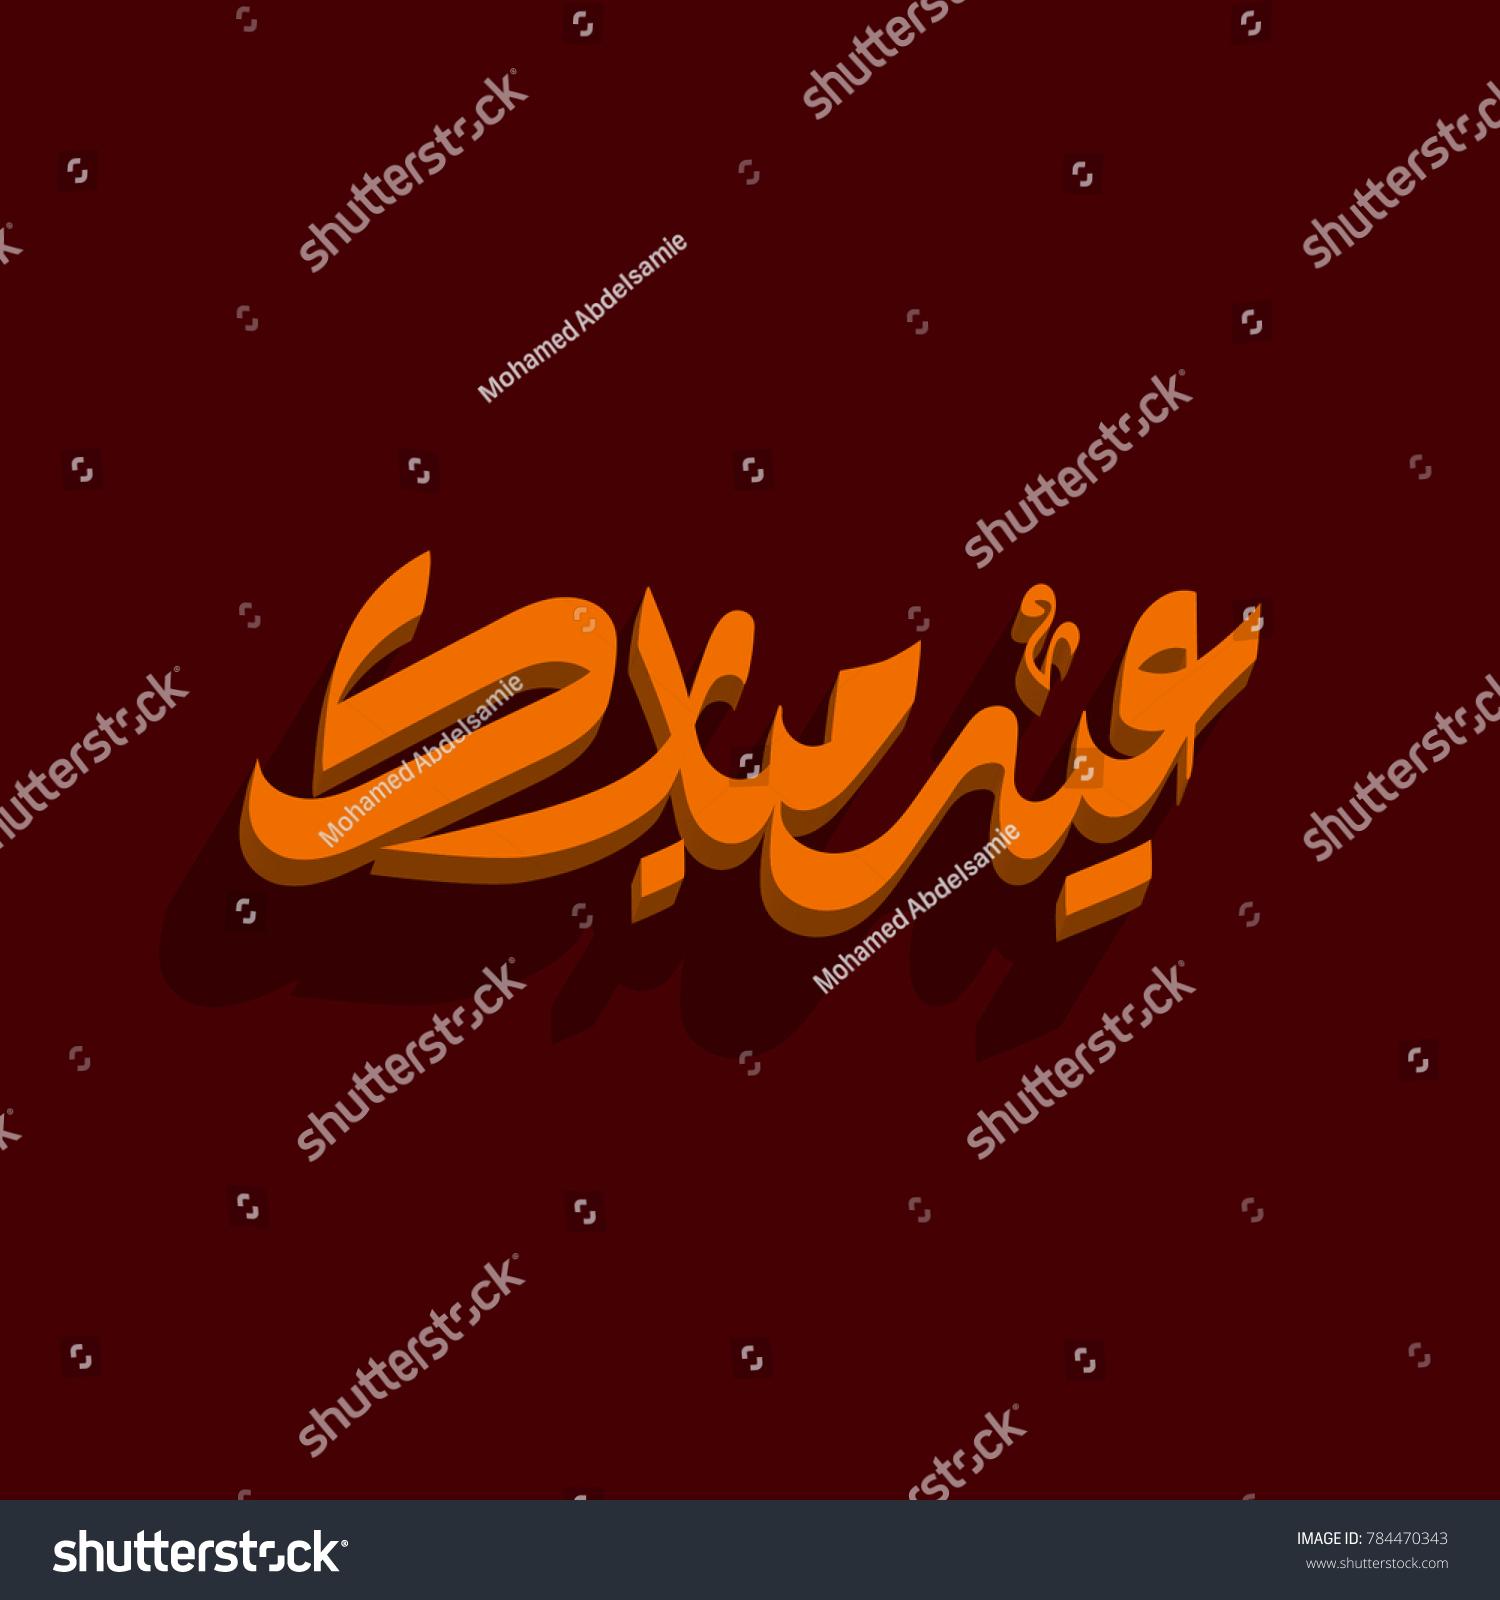 Blessed Eid Arabic Eid Mubarak Greeting Stock Vector Royalty Free